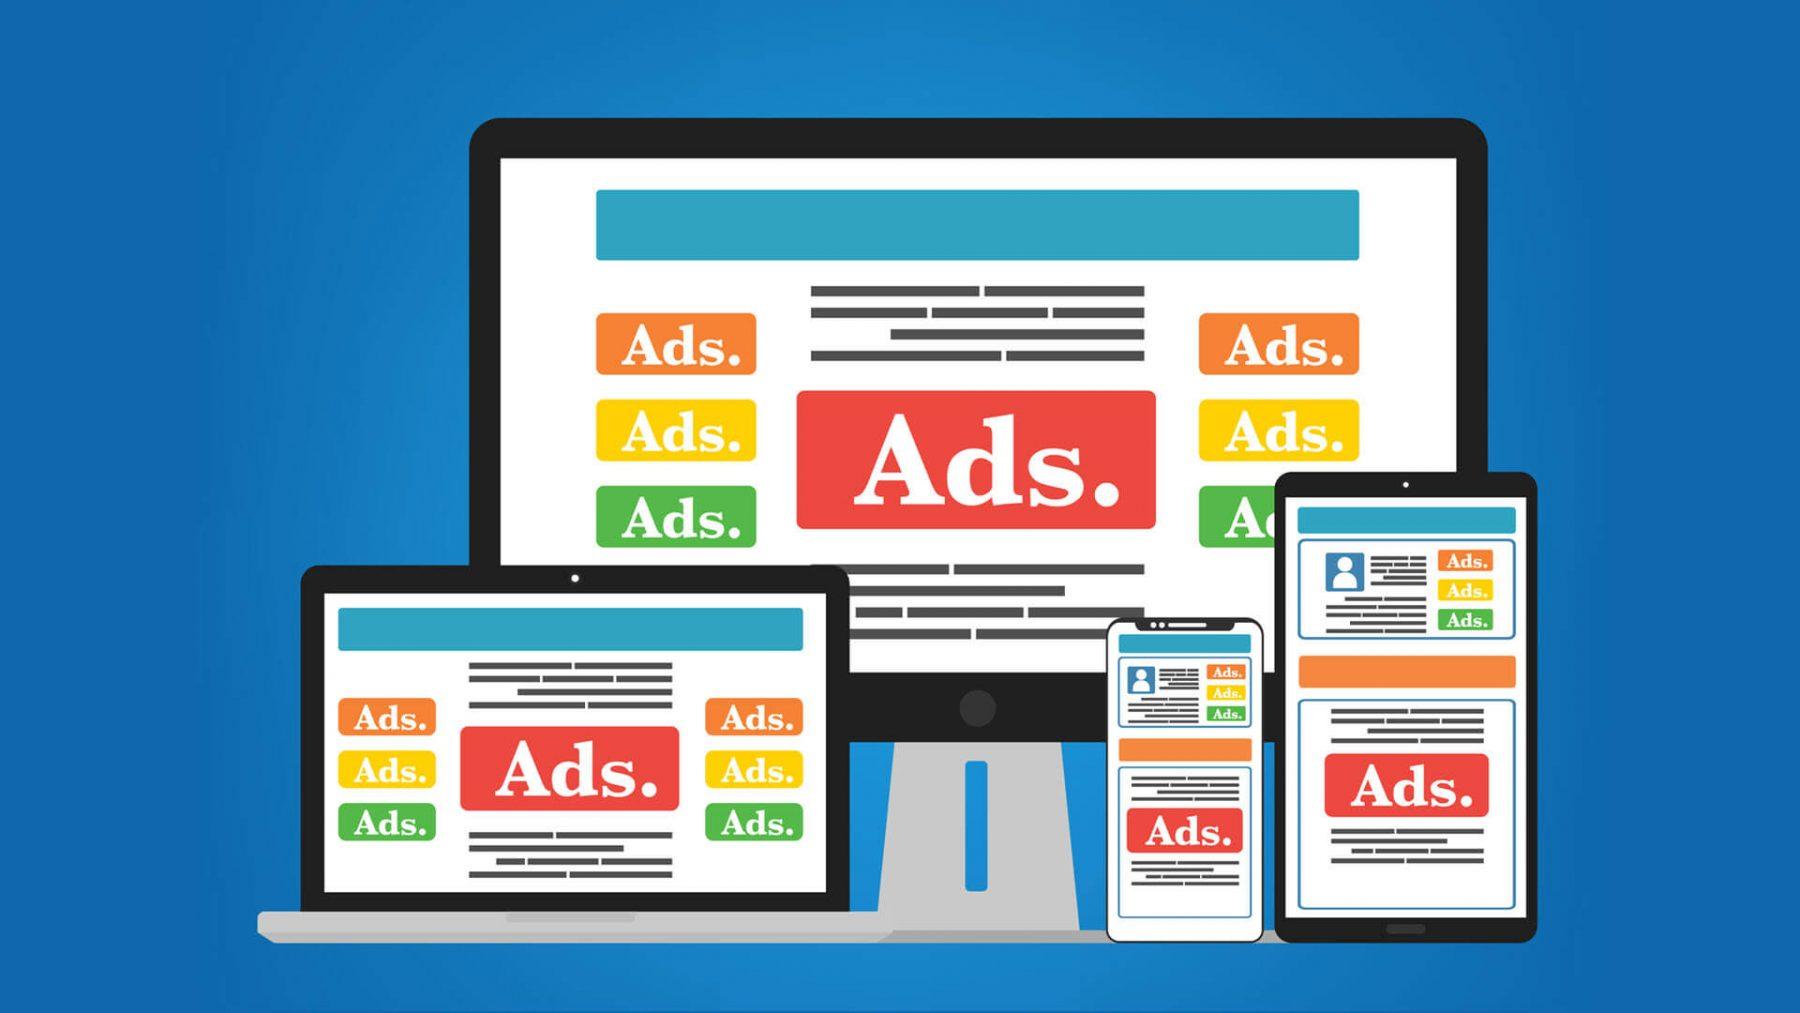 Media buyers predict double-digit online ad spending increases